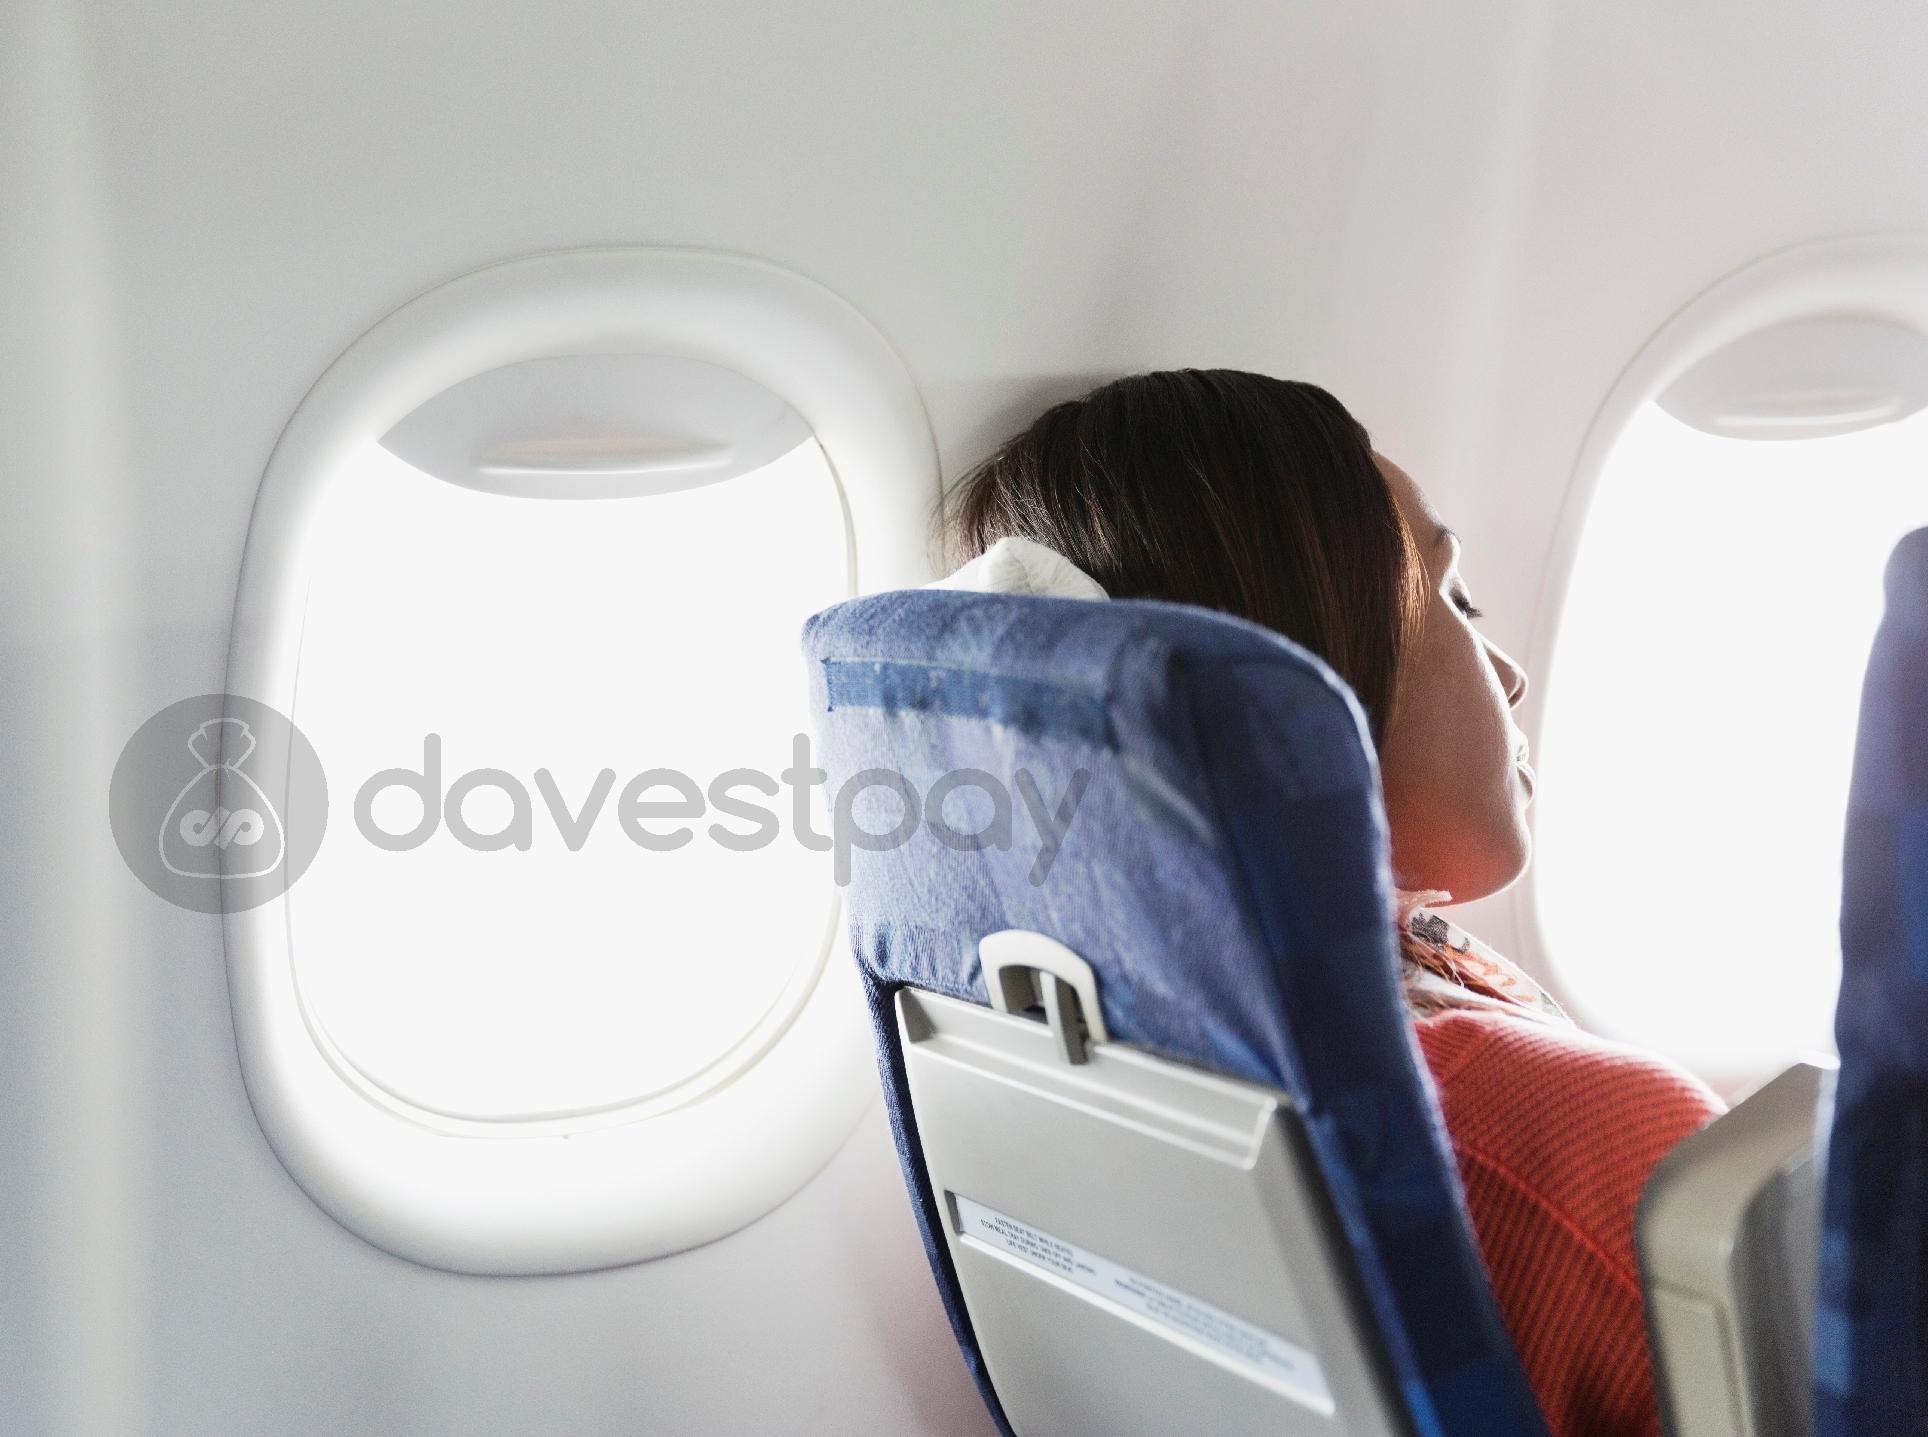 Mengapa Tidur Saat Pesawat Lepas Landas dan Mendarat Berbahaya?